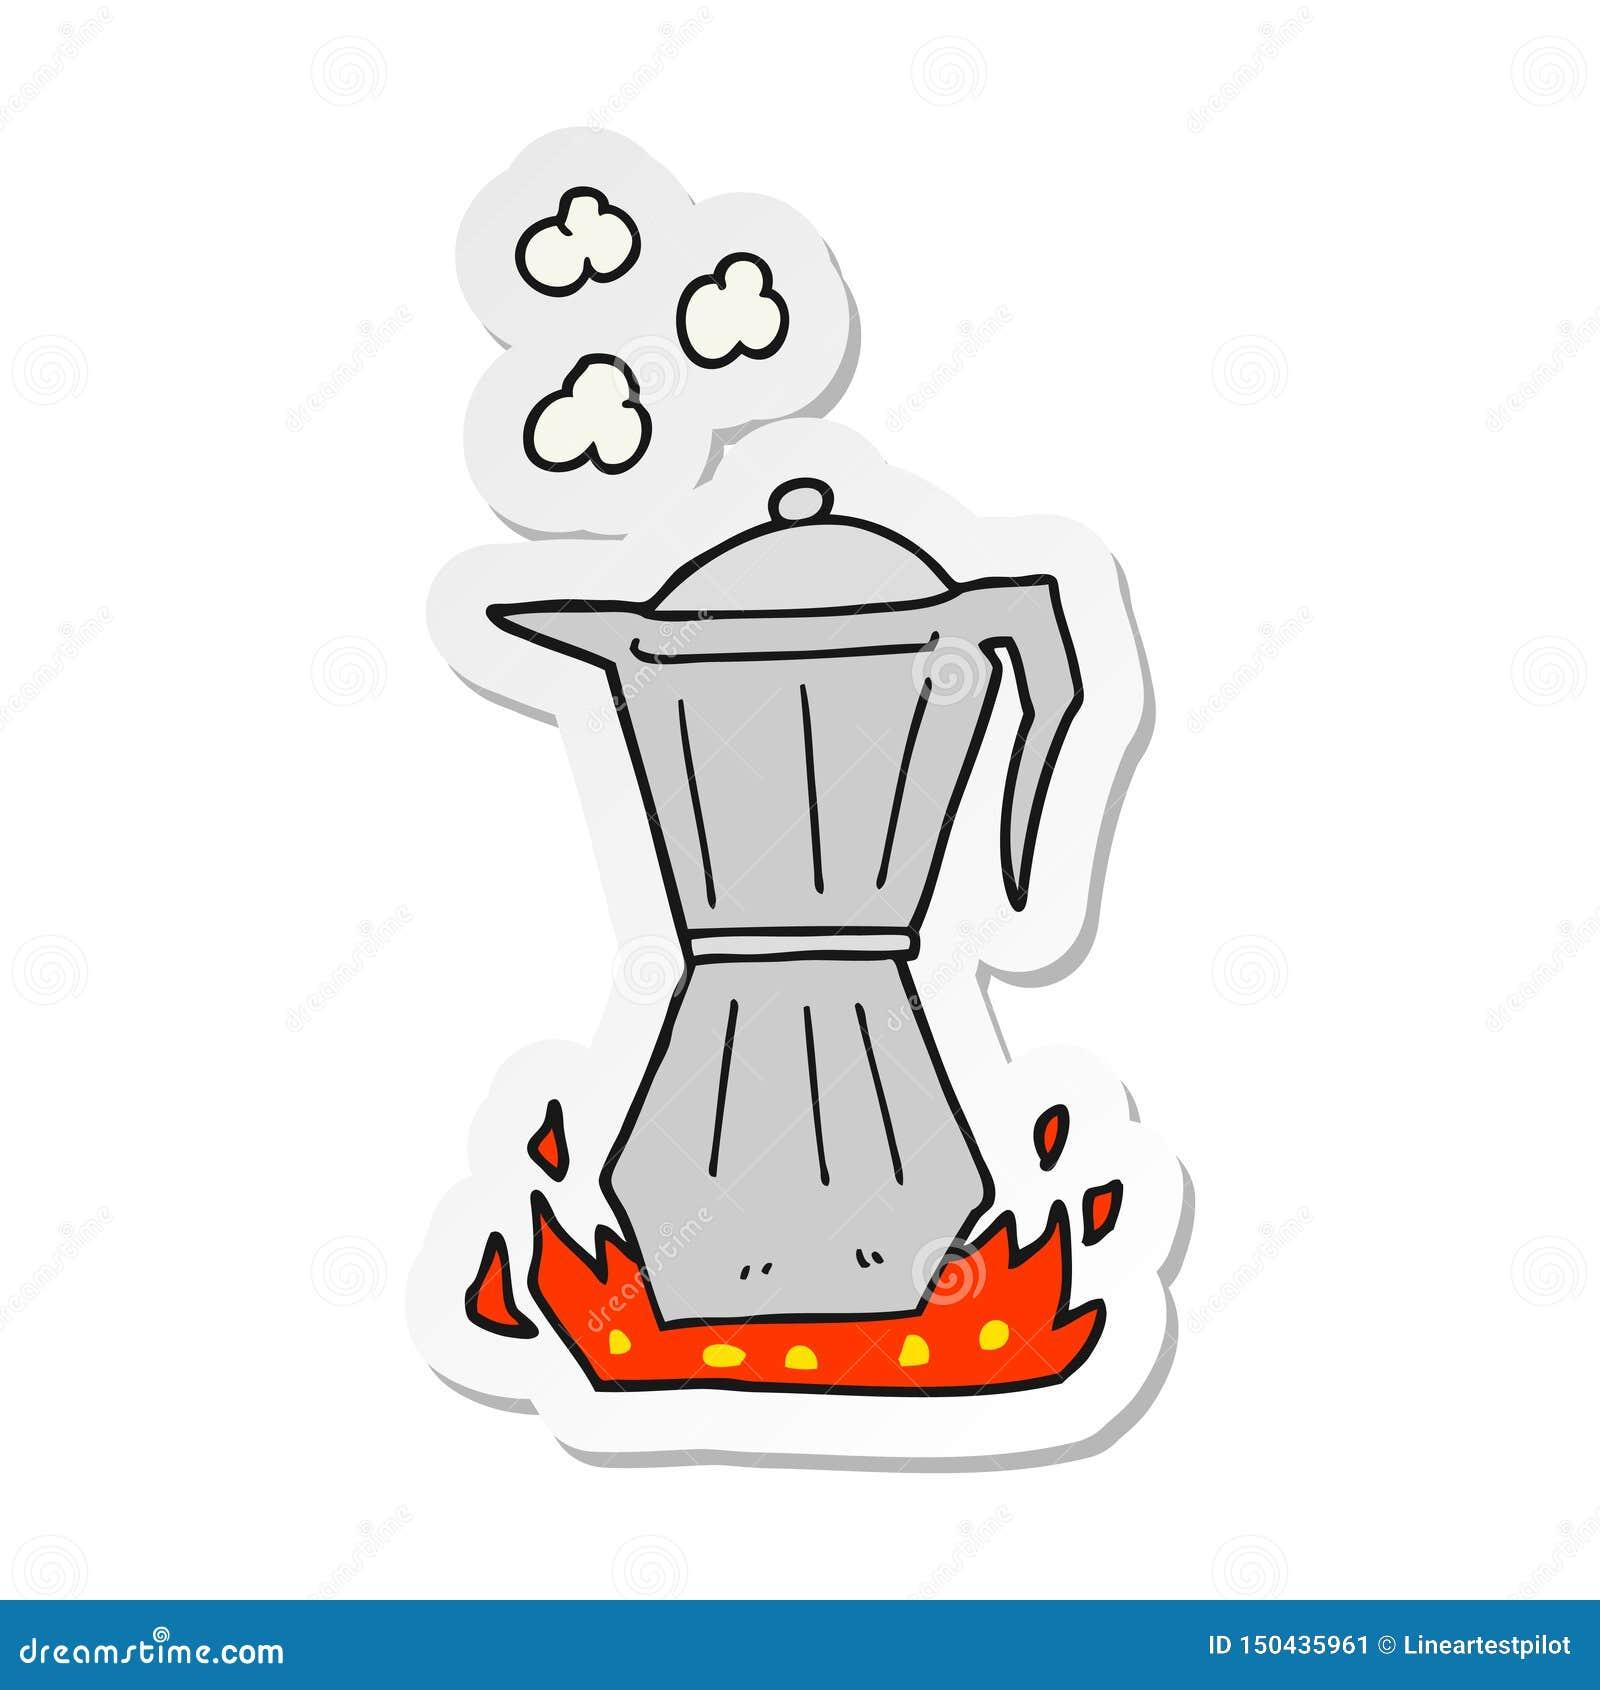 sticker of a cartoon stovetop espresso maker